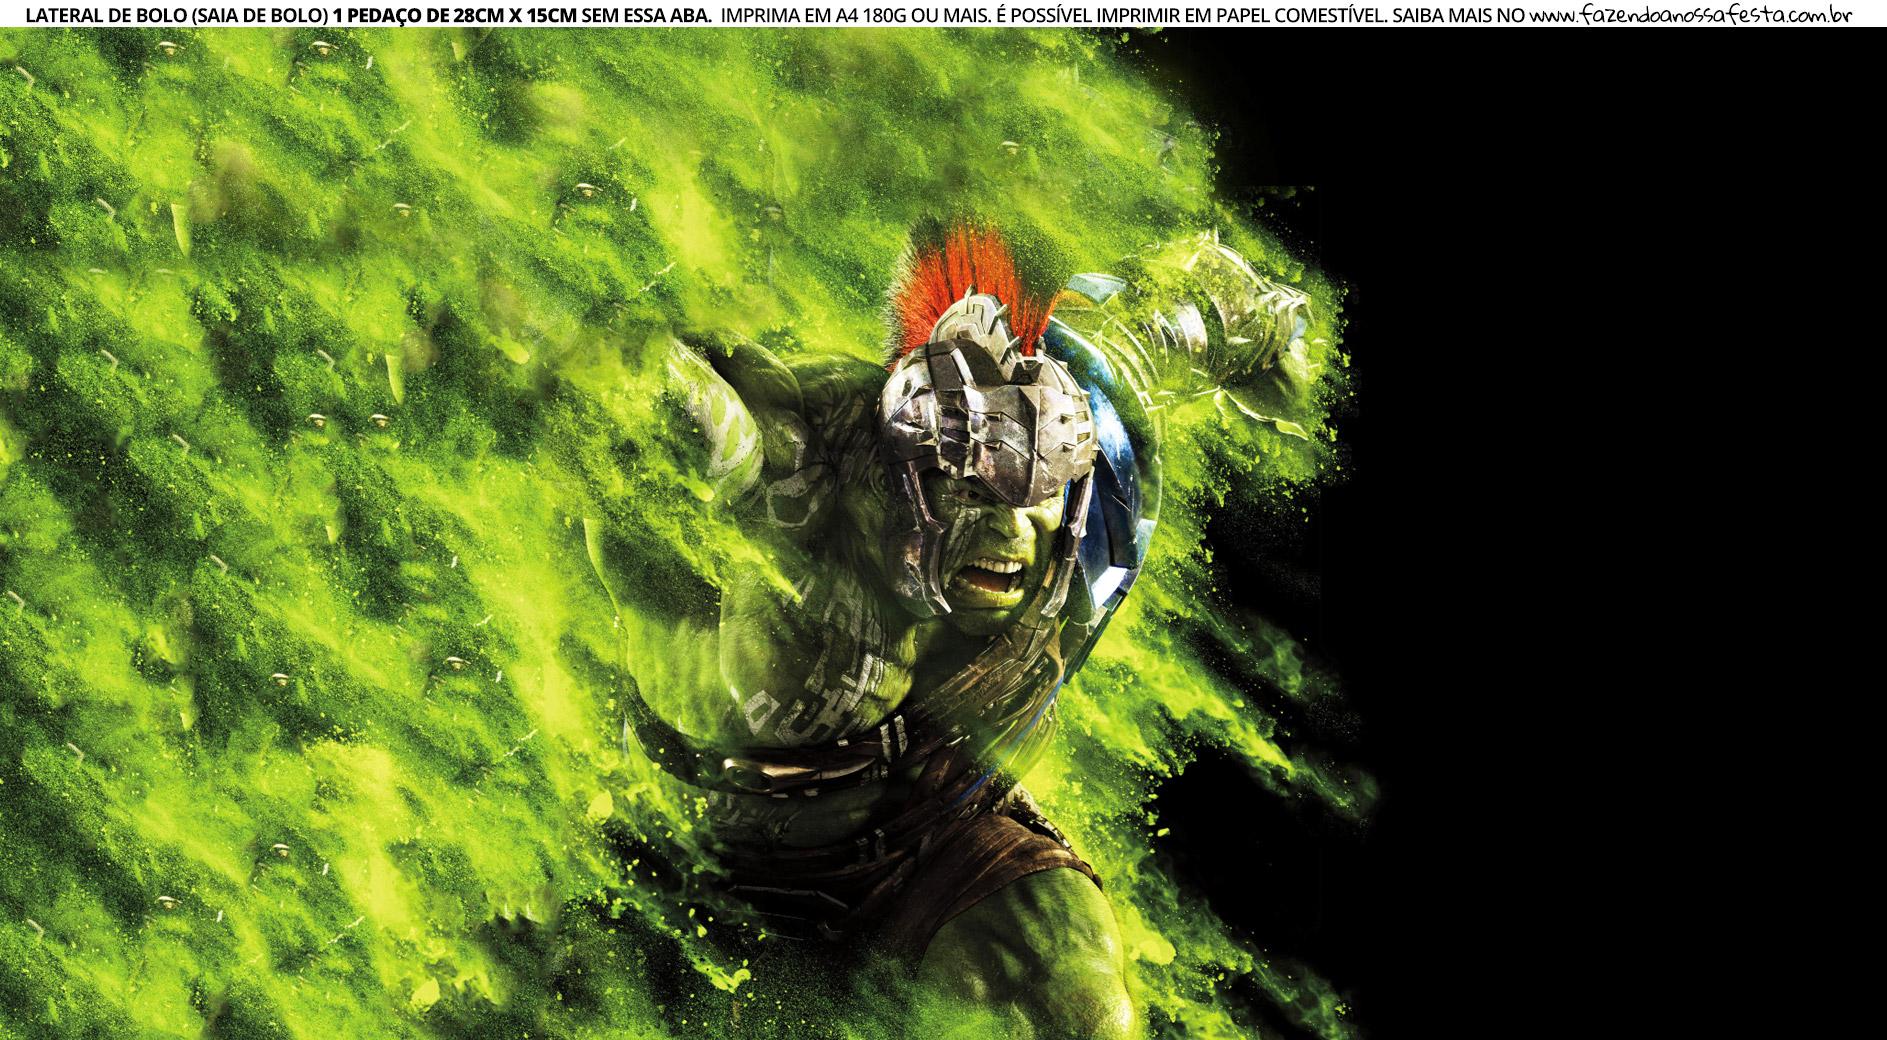 Faixa Lateral para Bolo Hulk 2